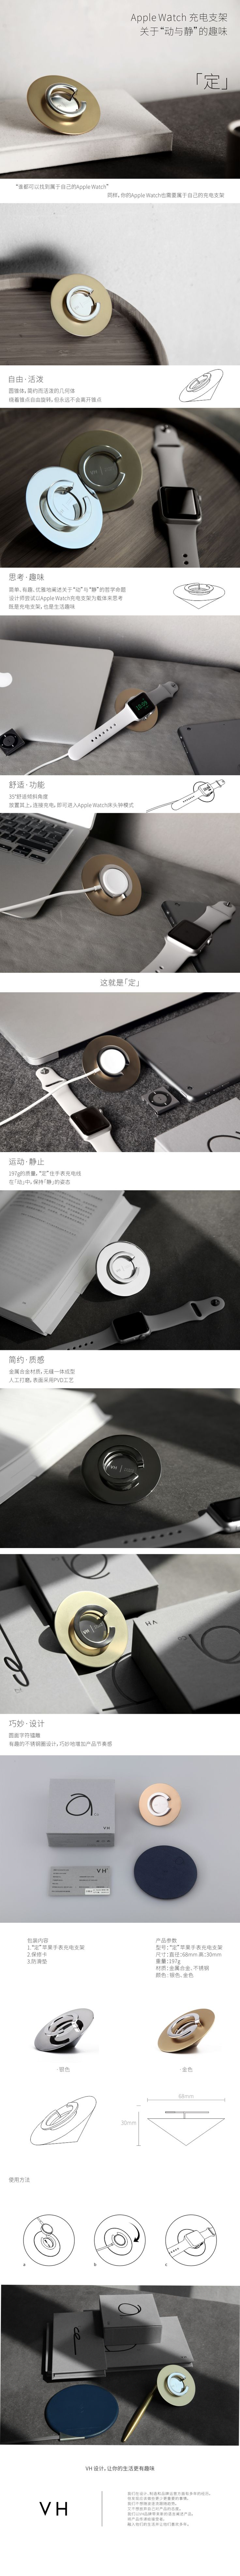 VH定 iPhone智能手表 支架手机支架 苹果手表iwatch充电架创意-tmall.com天猫